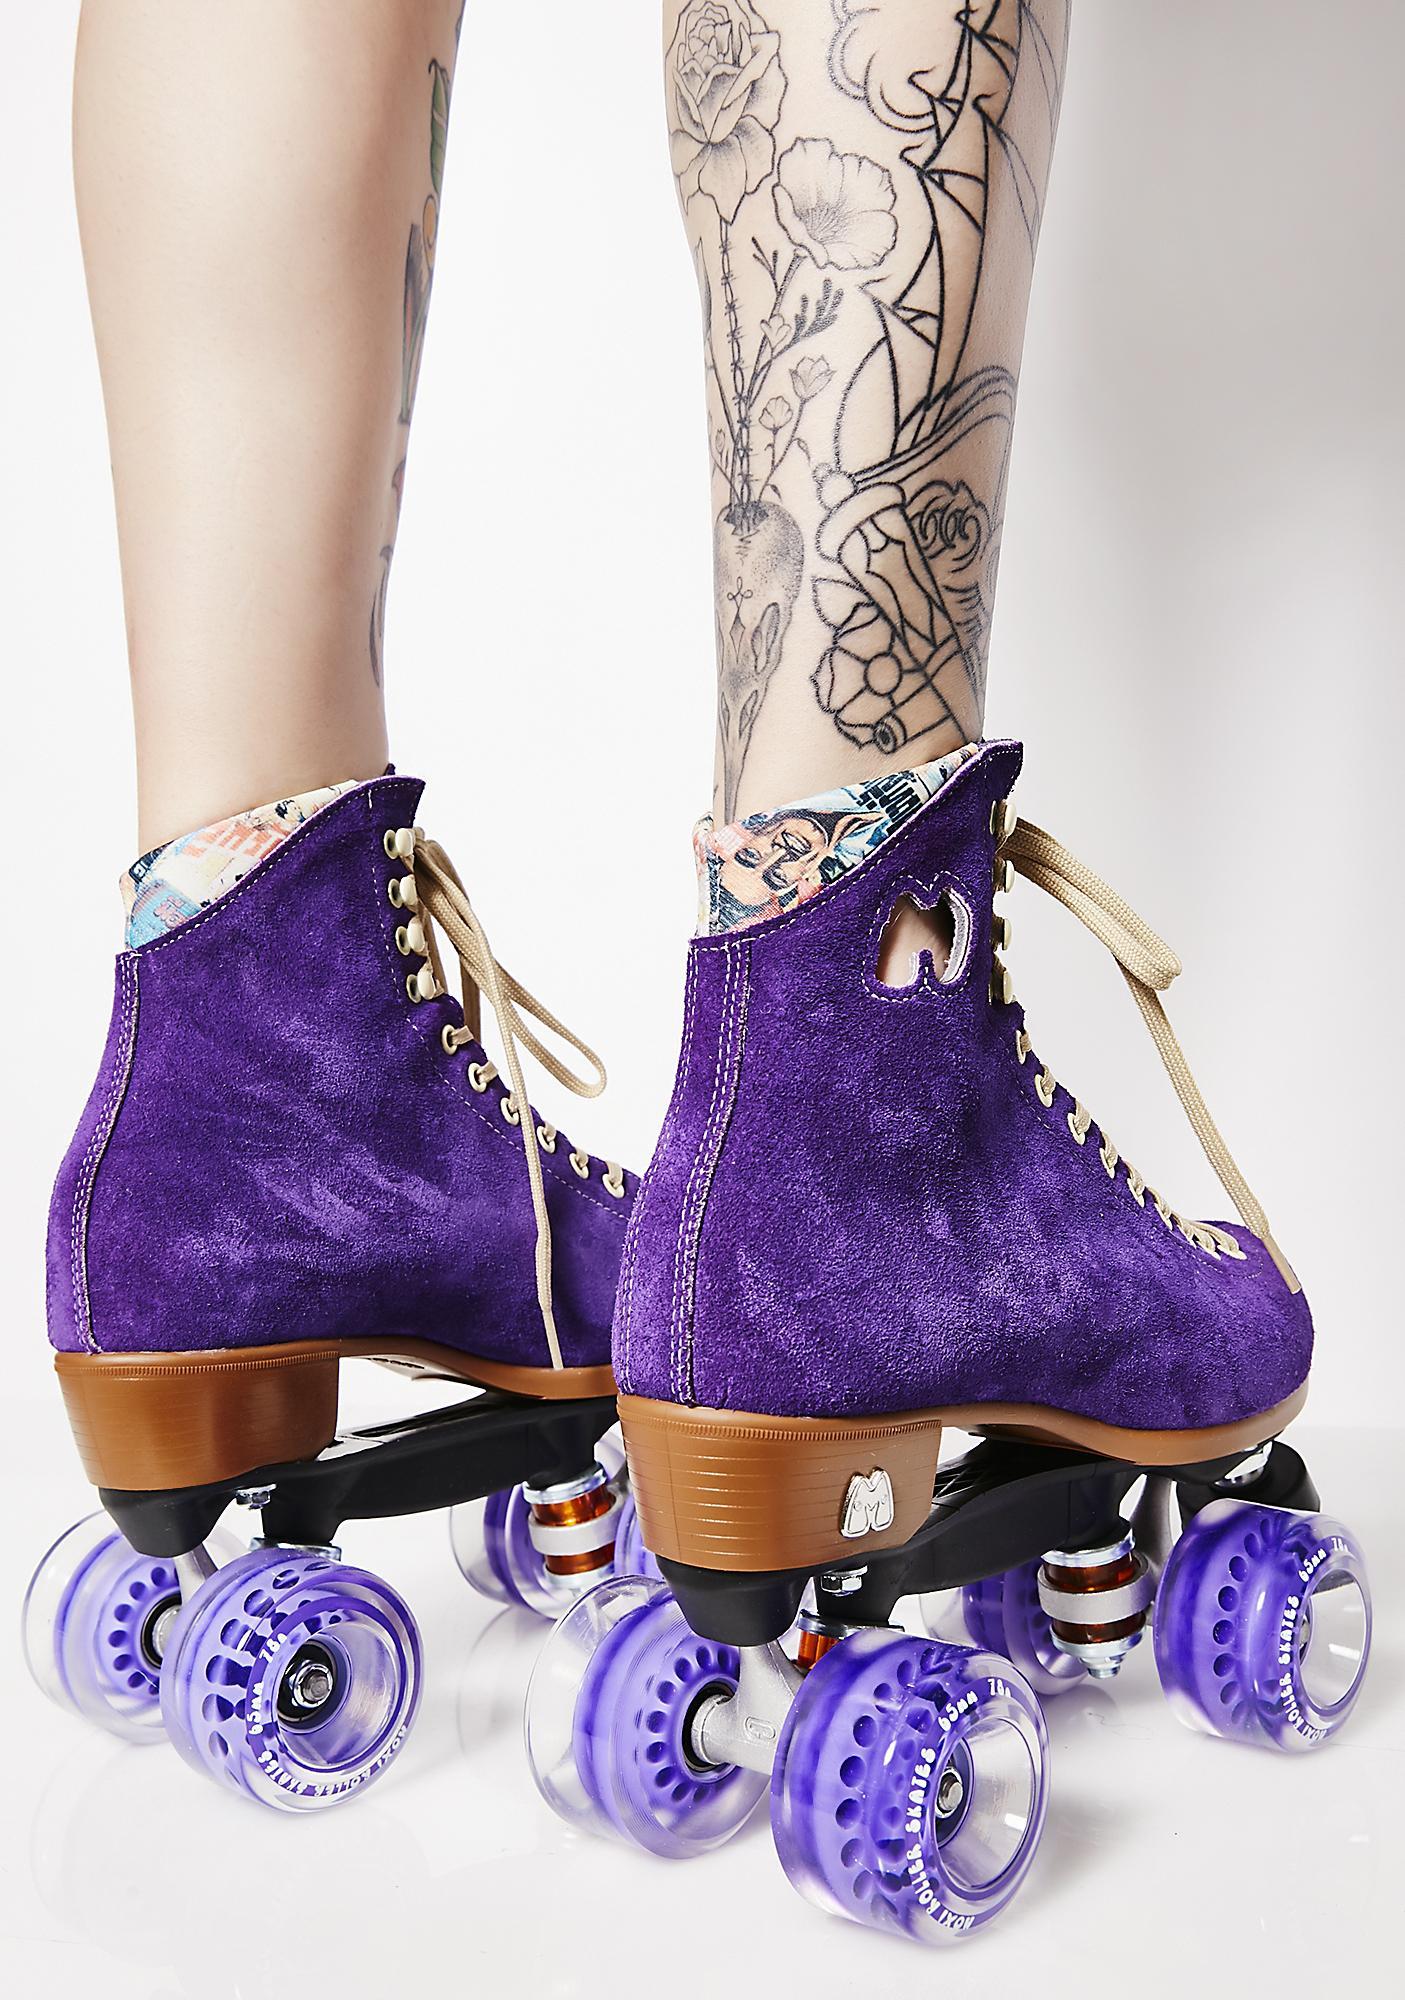 Moxi Roller Skates Grape Lolly Skates